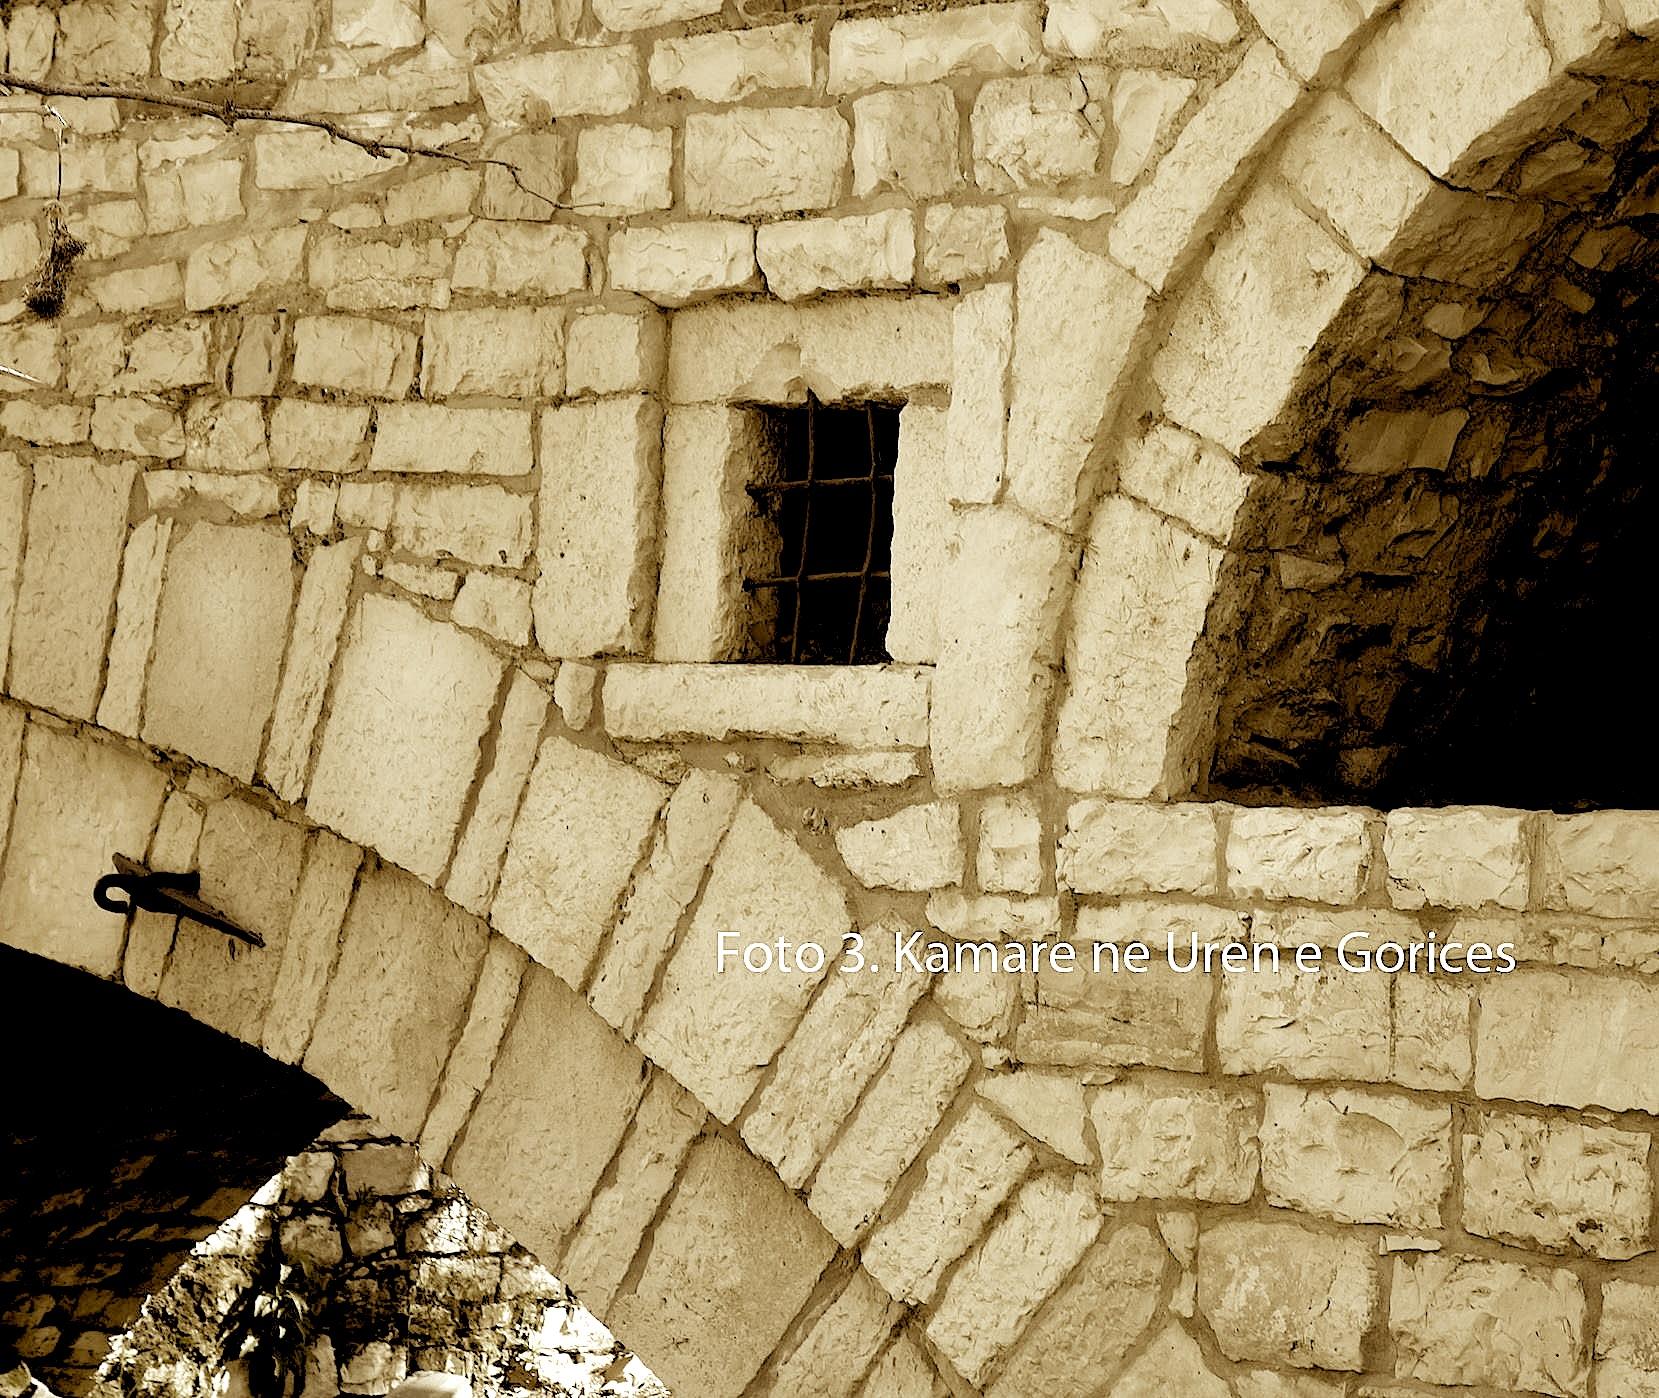 Kamare ne Uren e Goricës ku ka qene vendosur busti i flijimit)